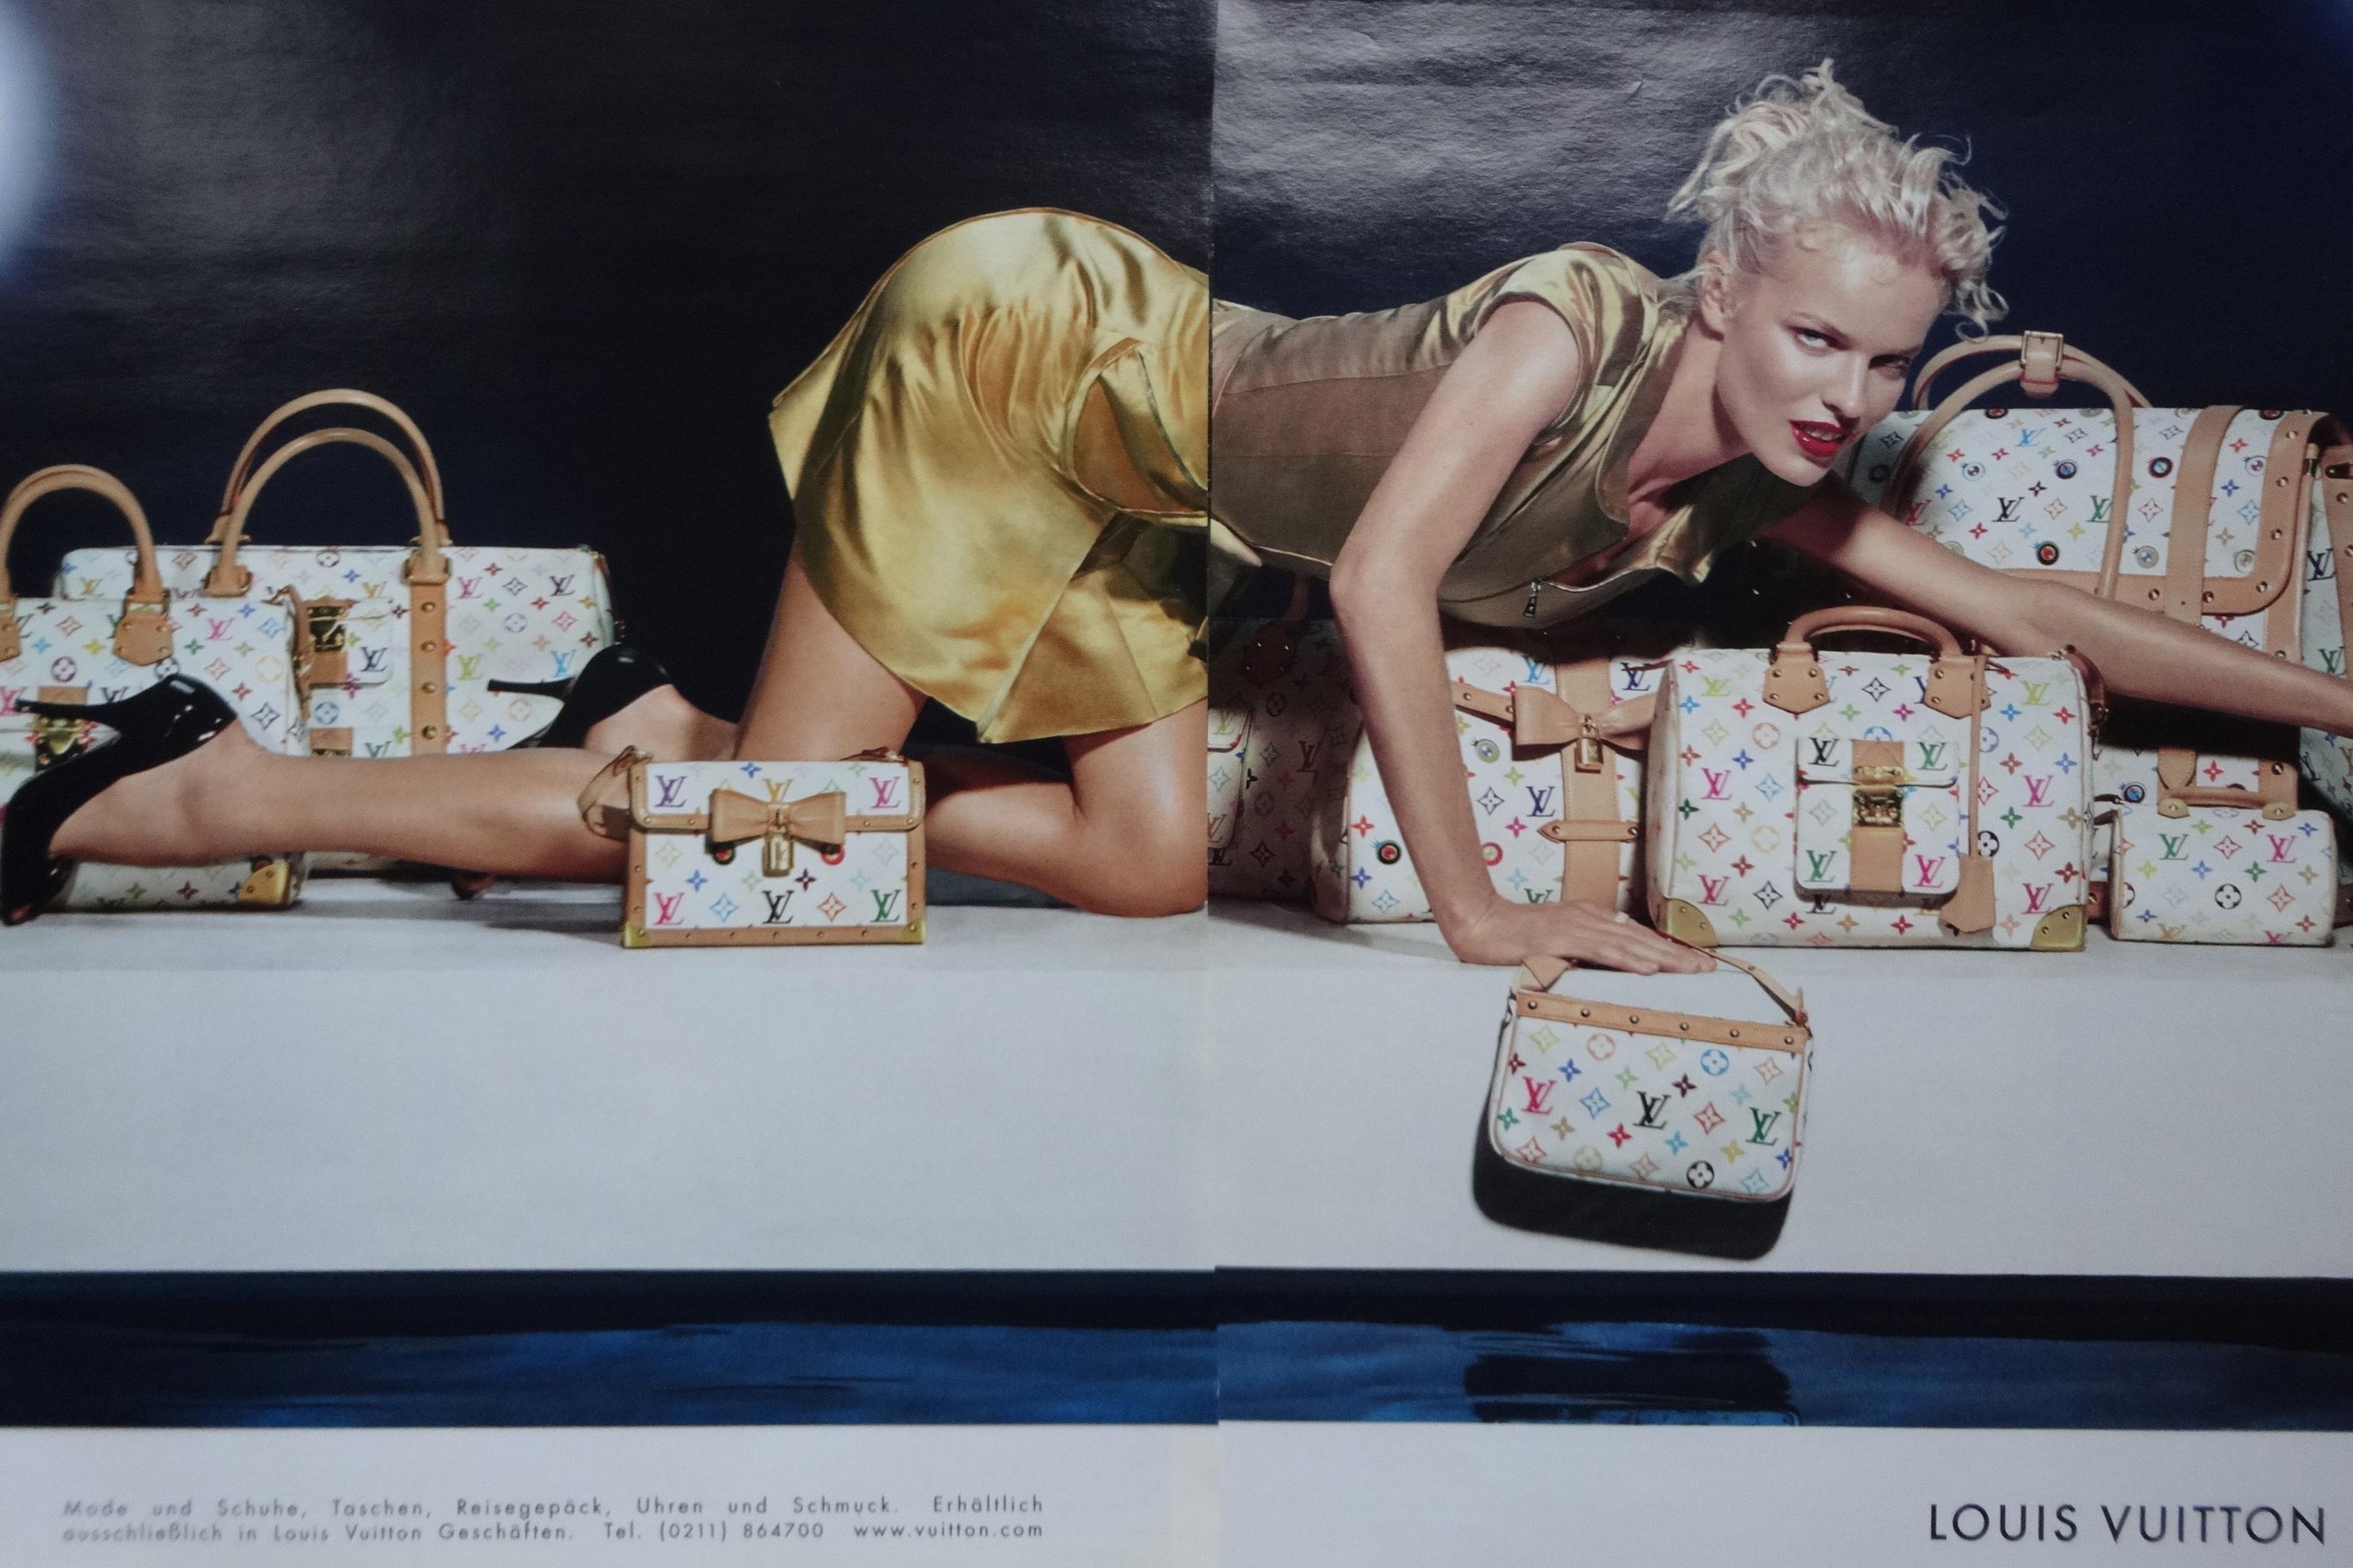 Multicolore ad 2003 (c) Louis Vuitton